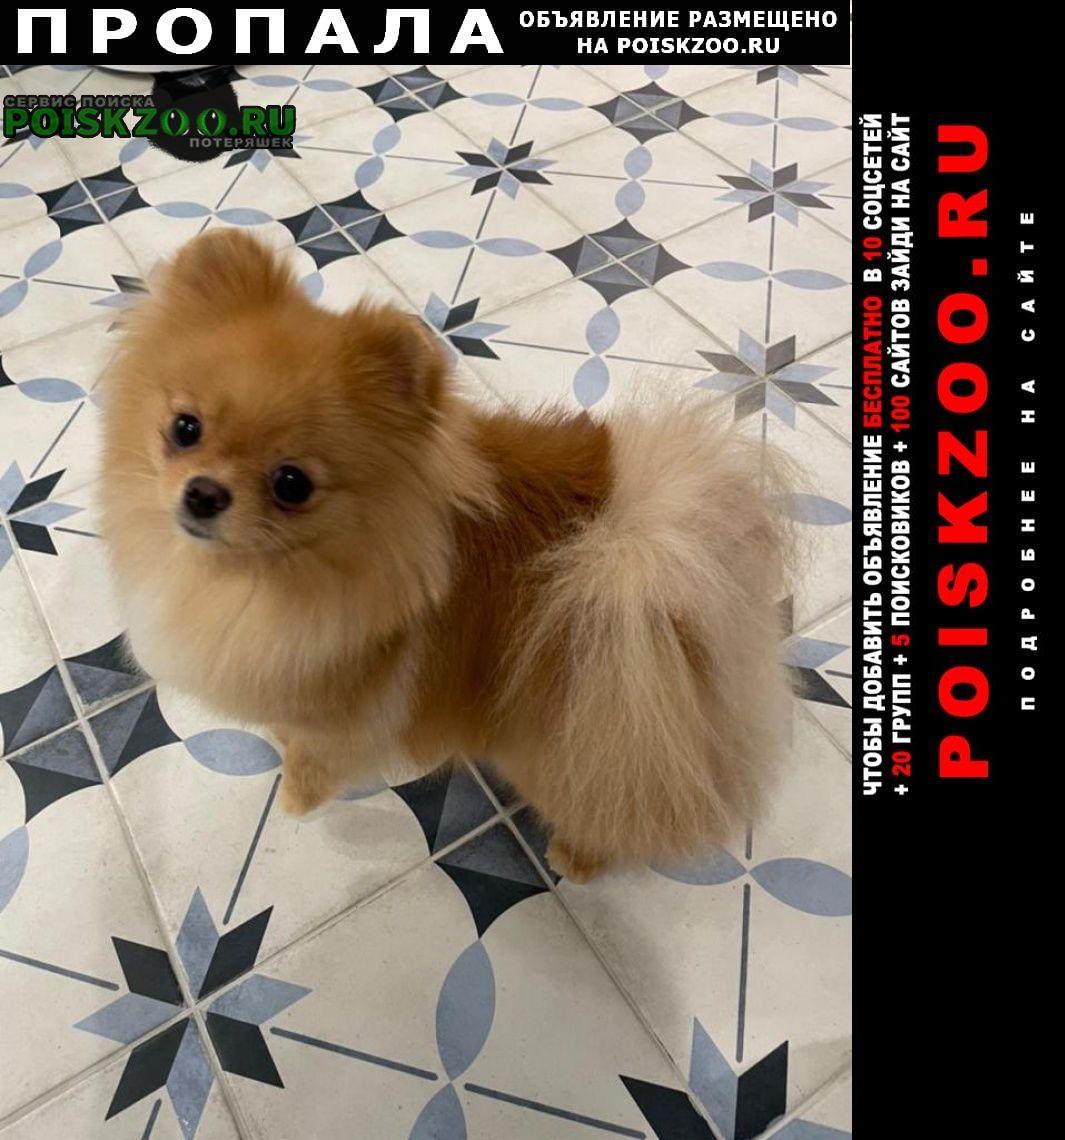 Пропала собака шпиц дэйзи Москва